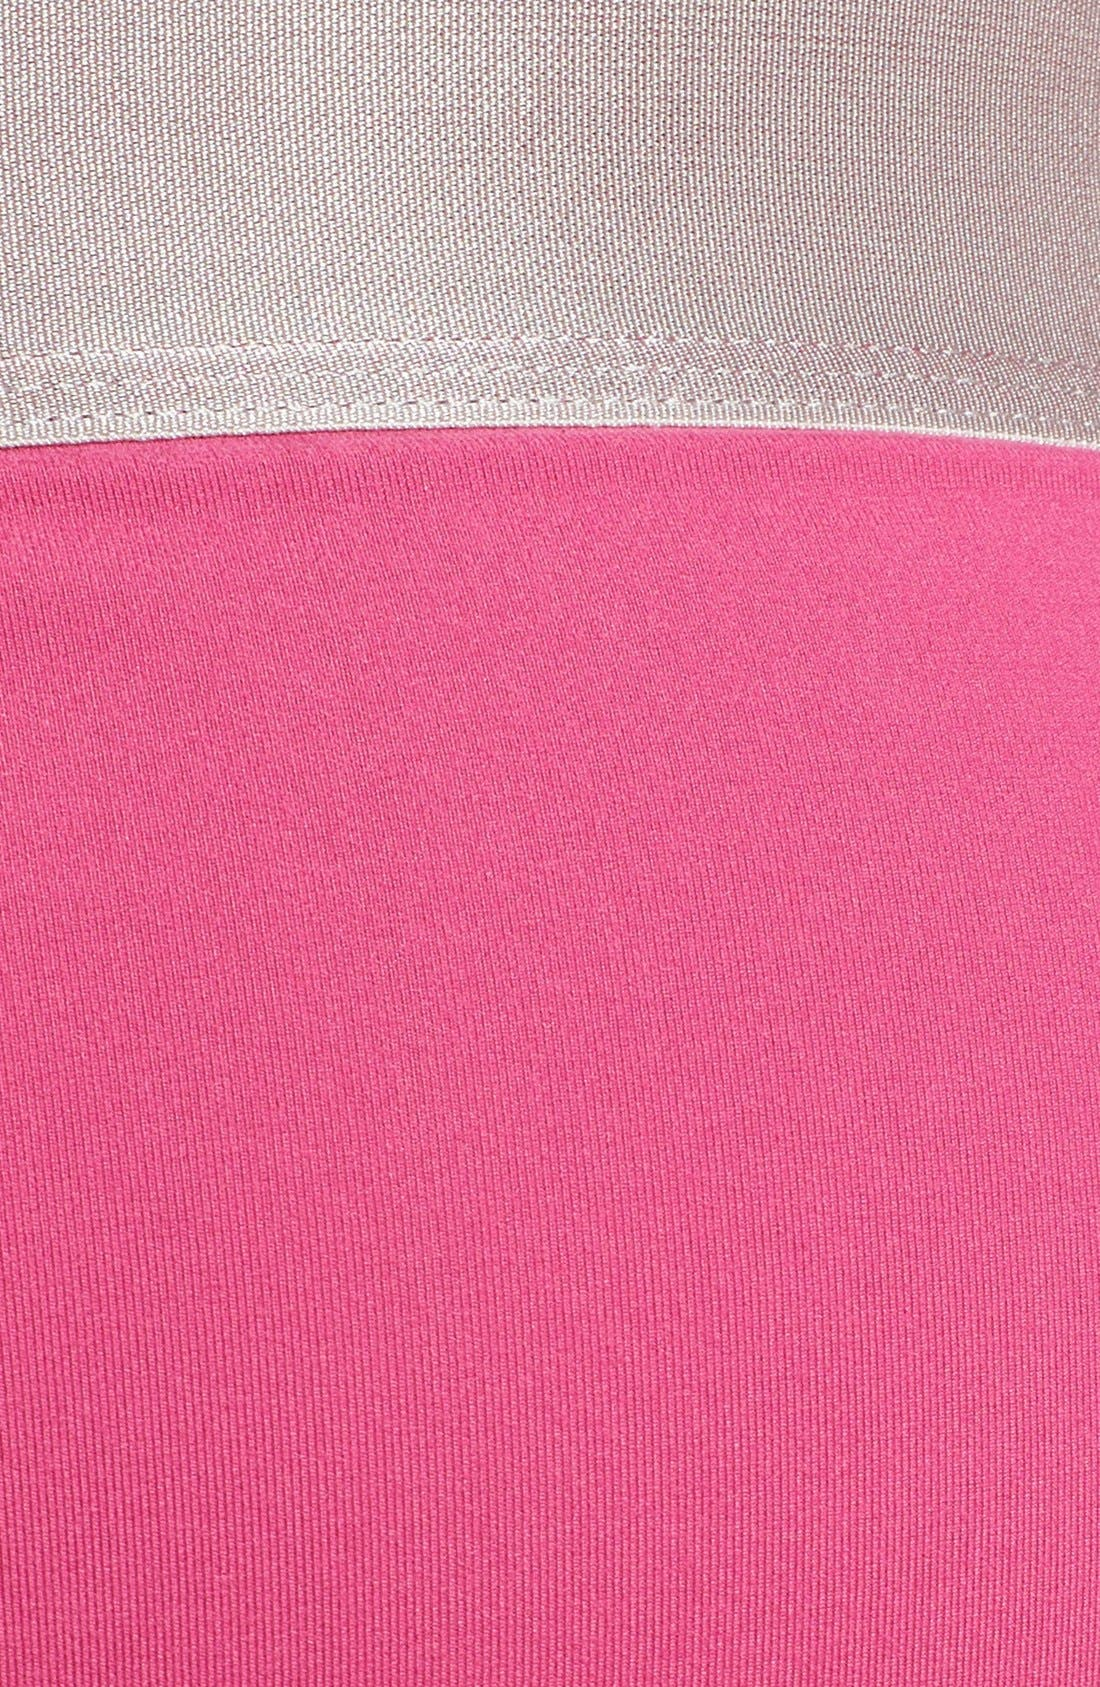 'Steel - U2715' Microfiber Hip Briefs,                             Alternate thumbnail 114, color,